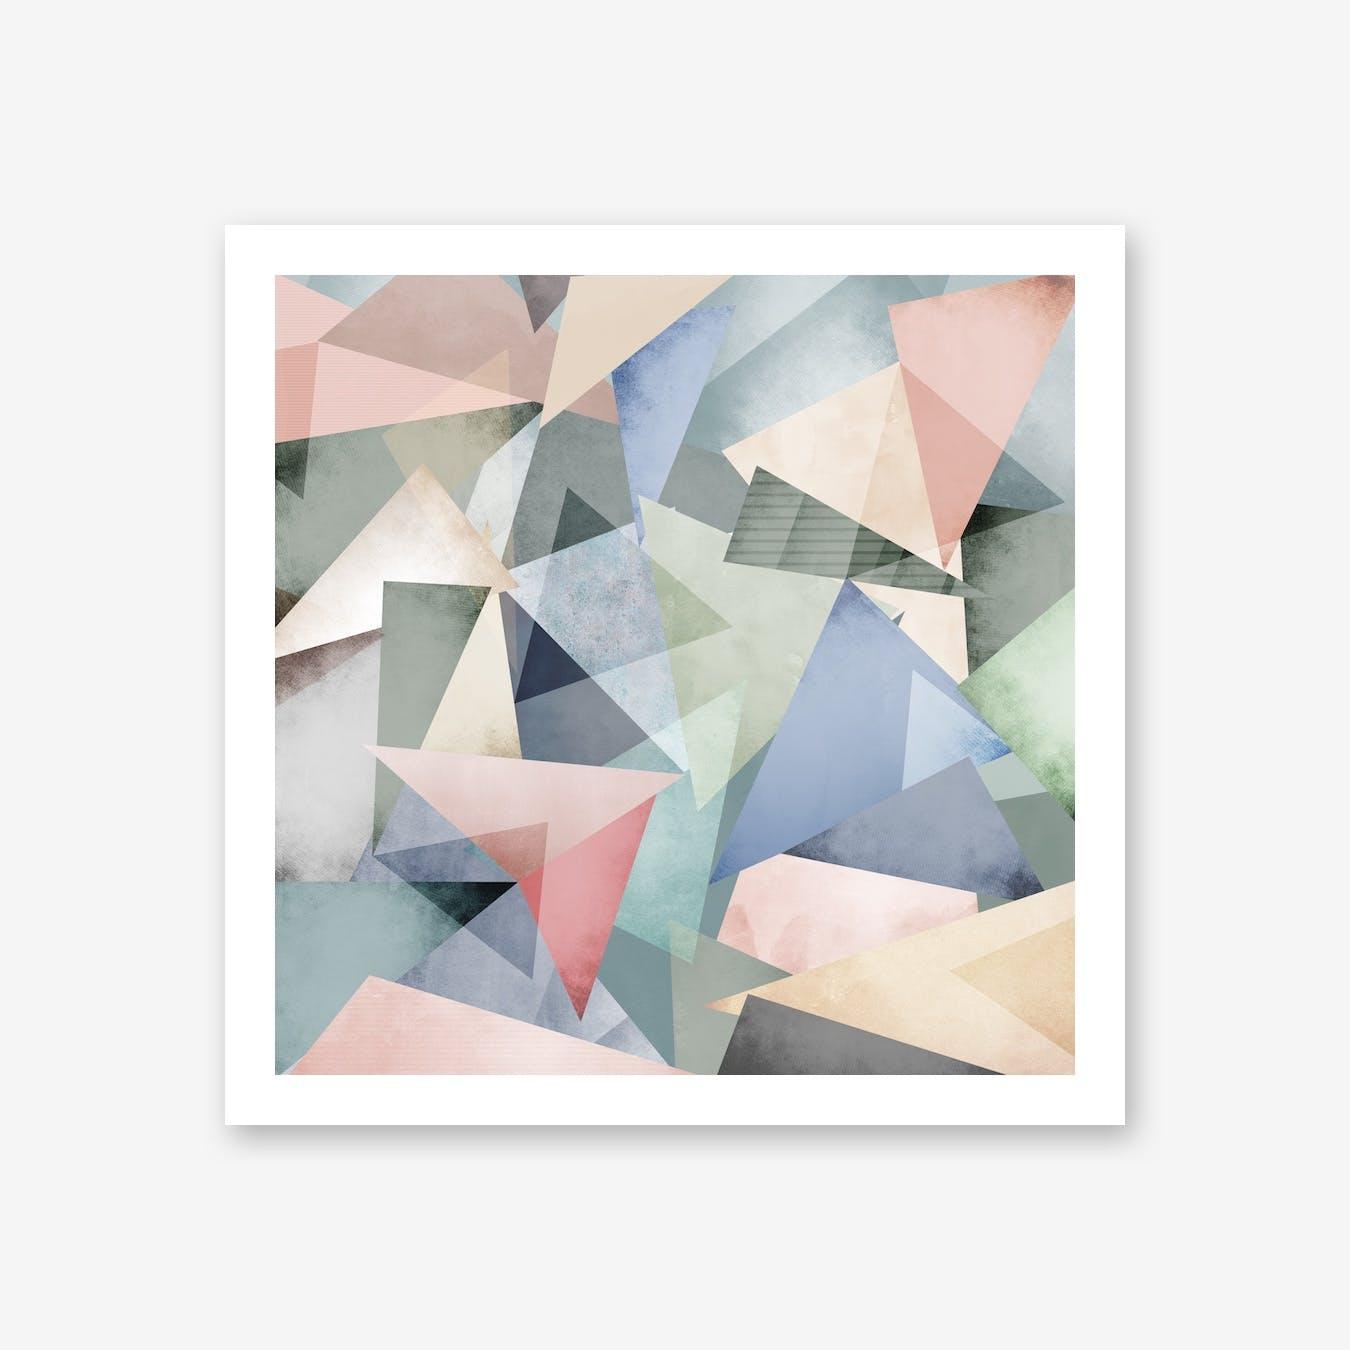 Fragments 3